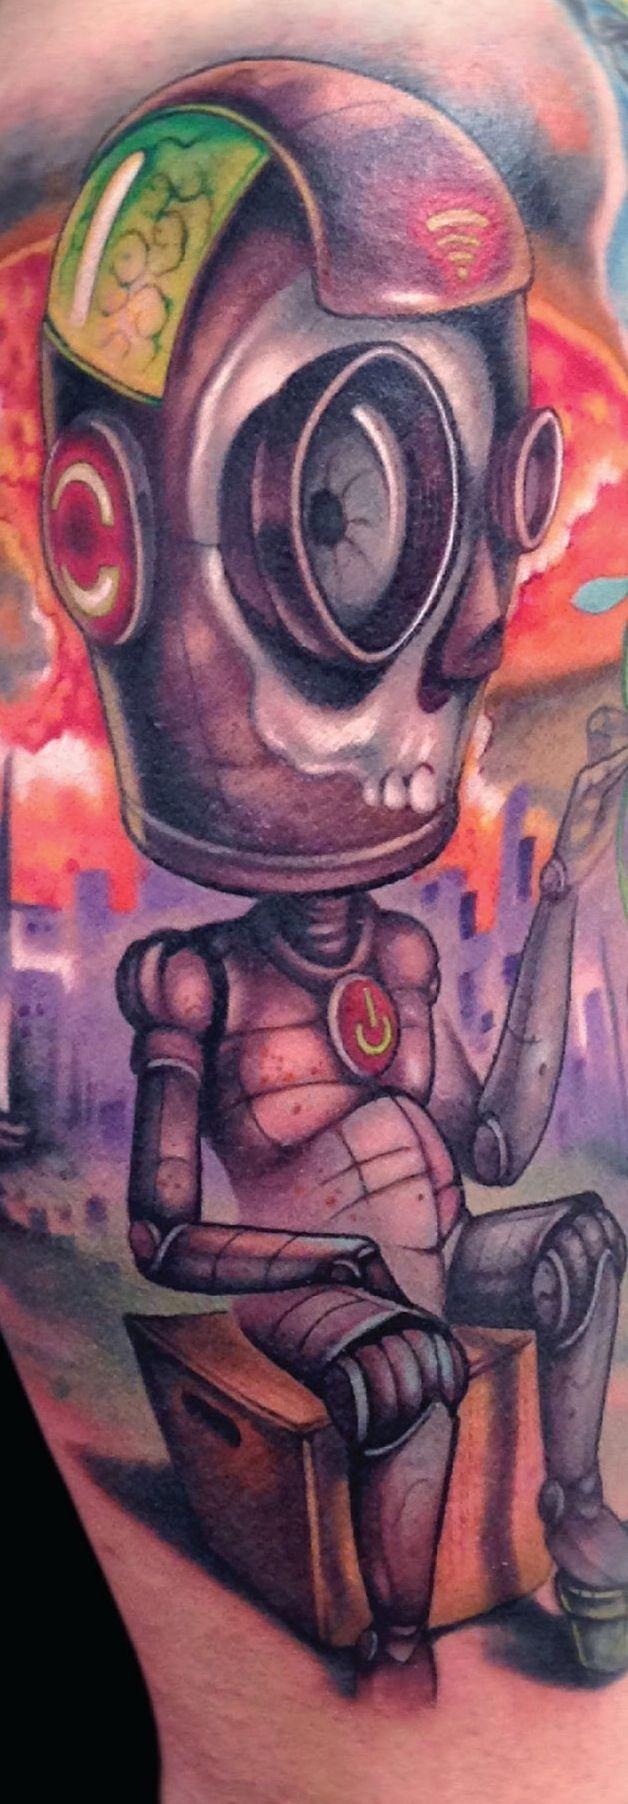 Robot by Jose Mota Ortega